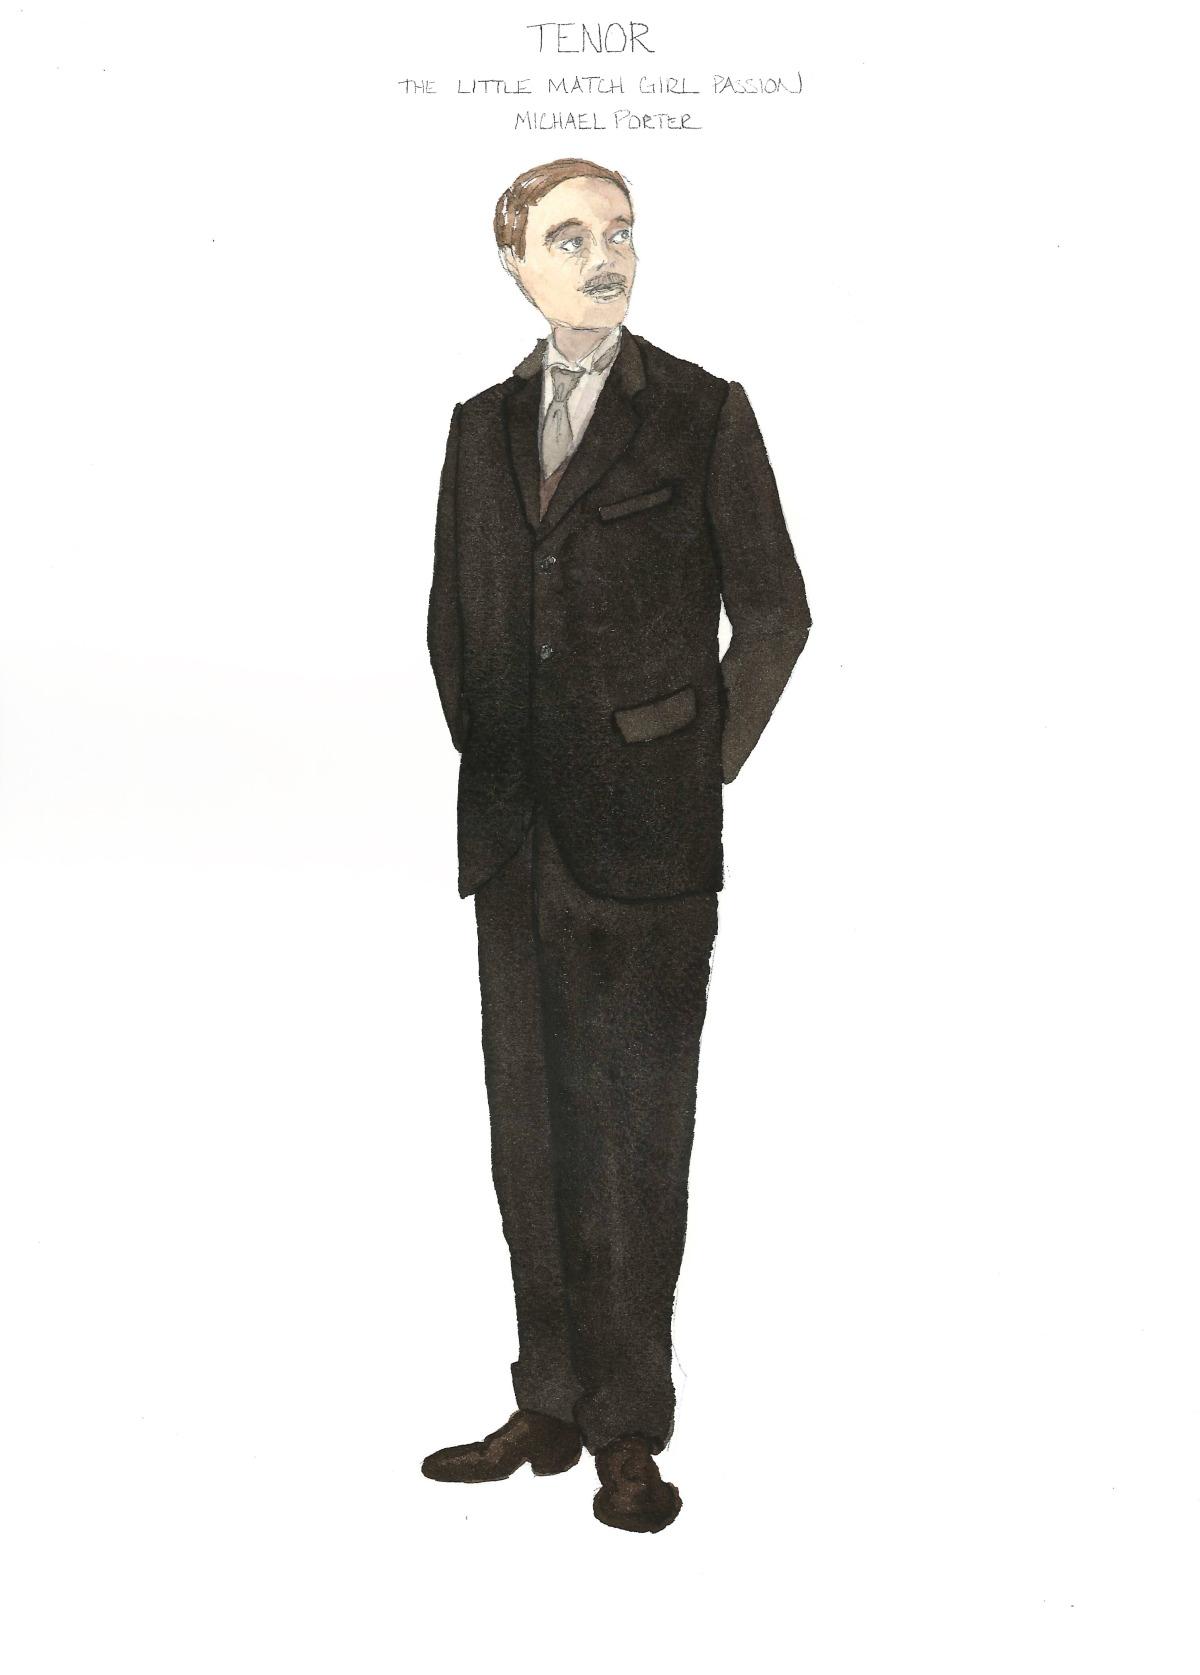 7lmgp+porter+2+suit.jpg